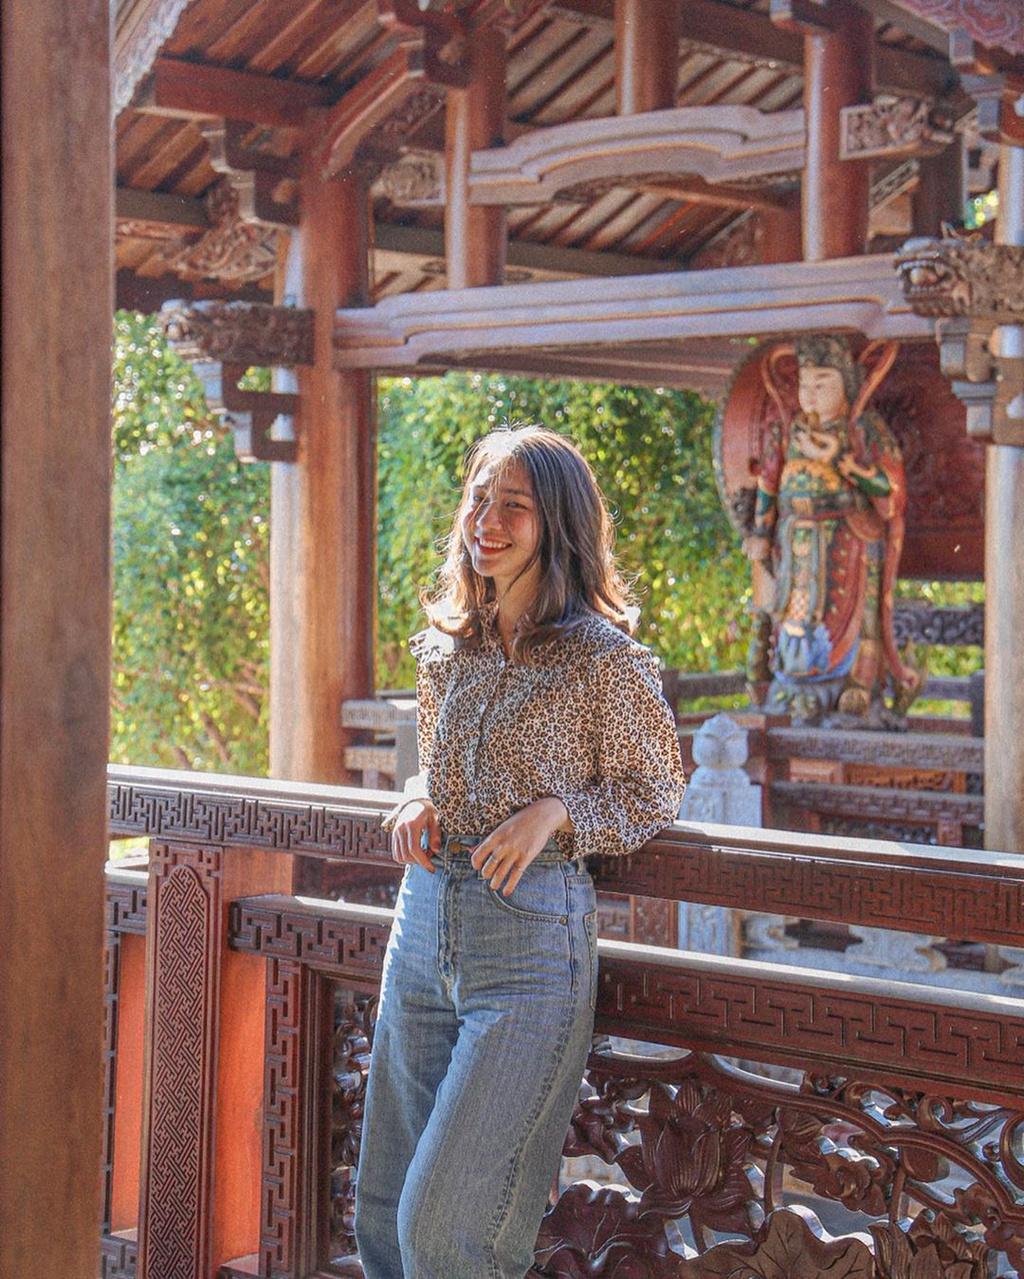 Chua co Buon Ma Thuot hut gioi tre check-in hinh anh 3 s4.jpg